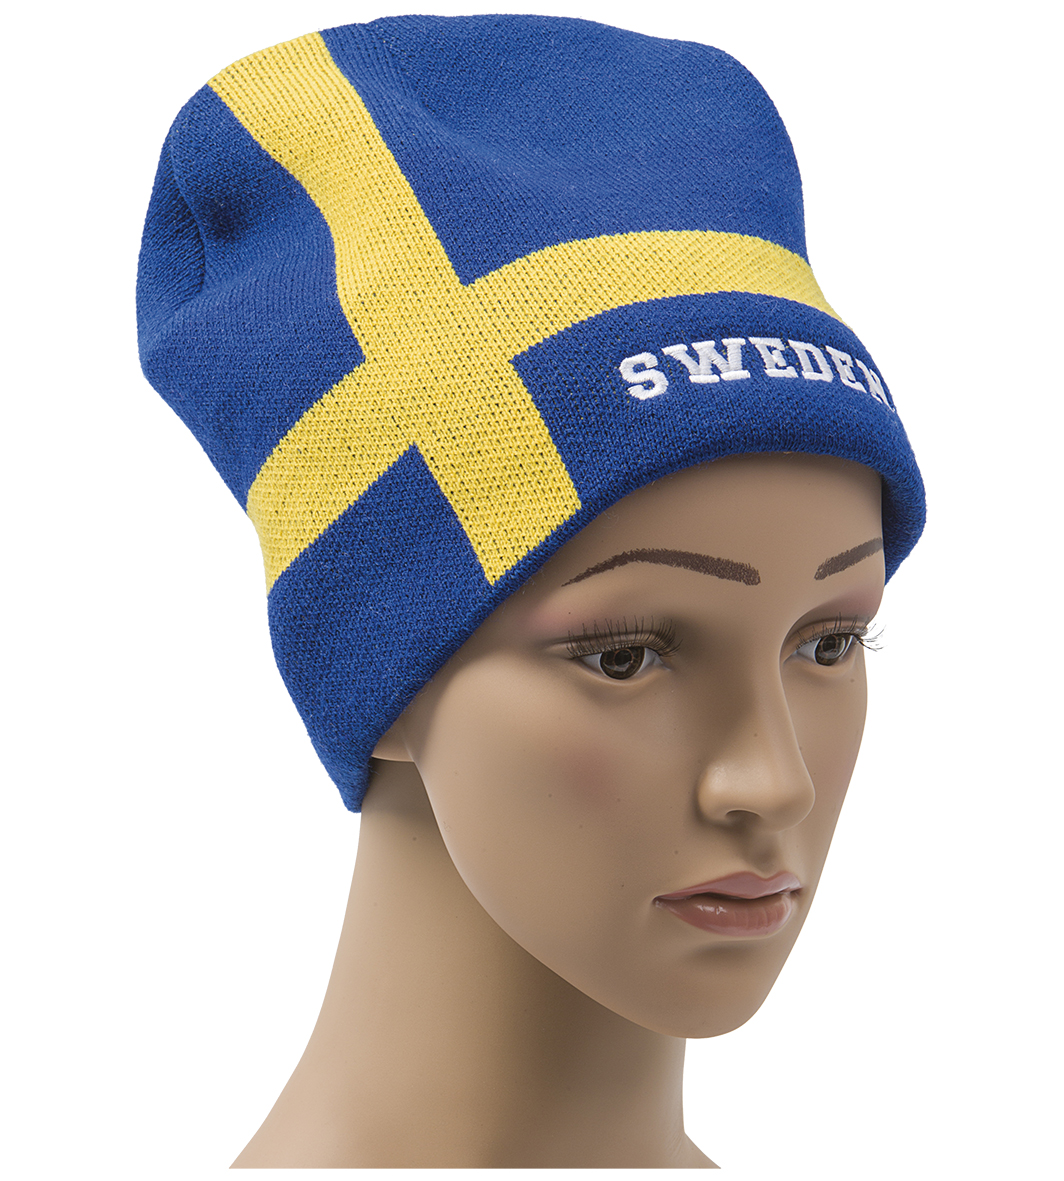 Beställ Colospa Sverige